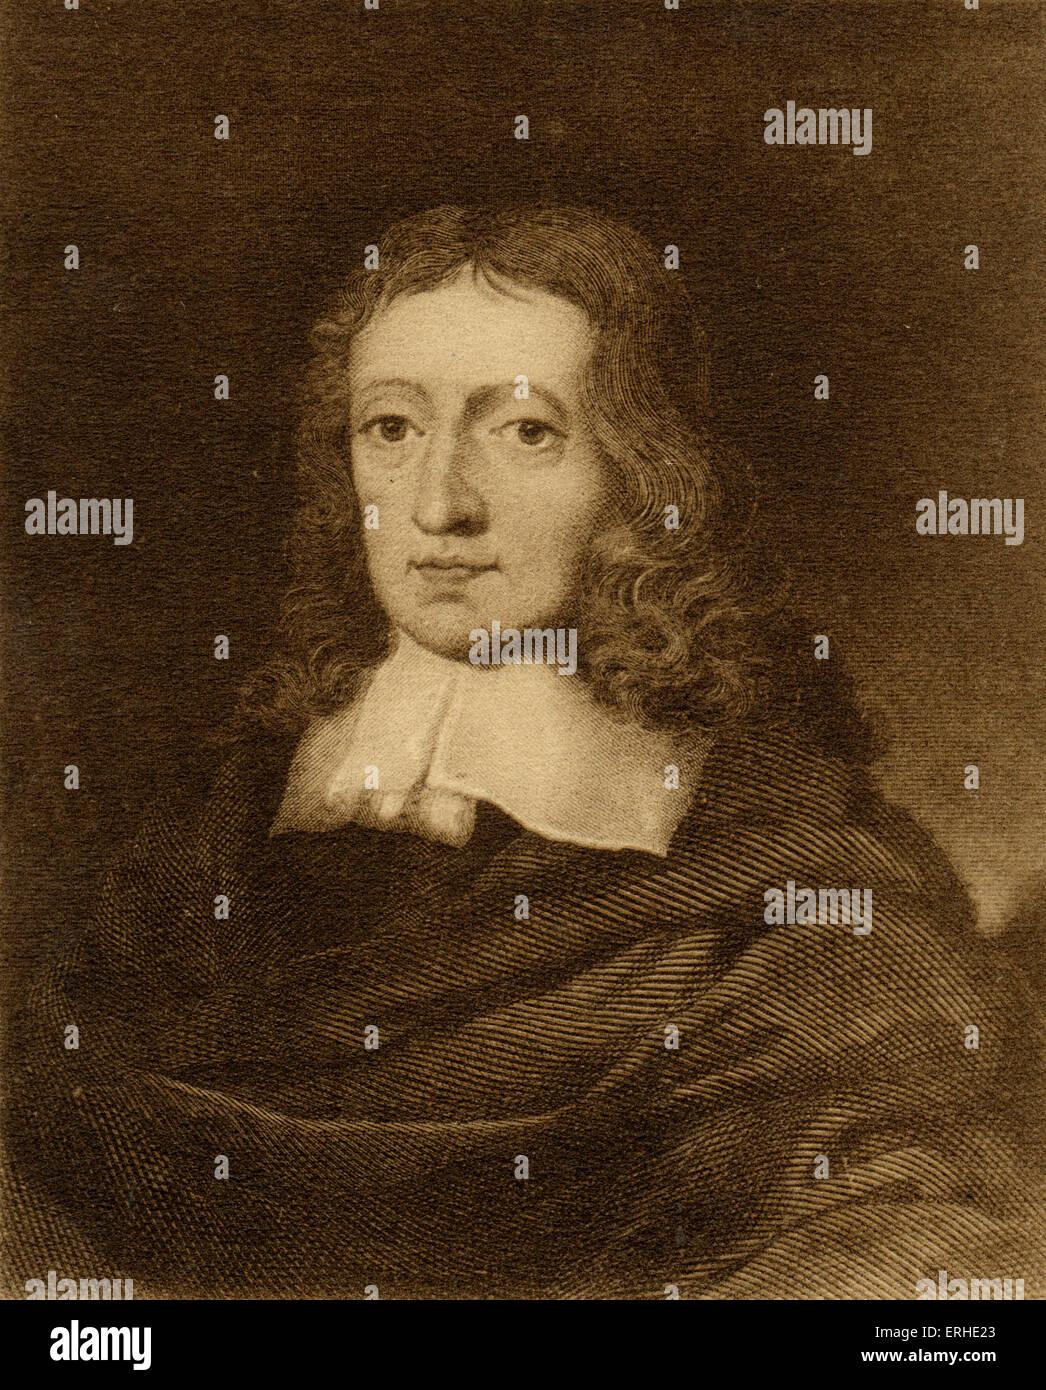 John Milton - portrait of English poet 9th December 1608 - 8th November 1764 - Stock Image